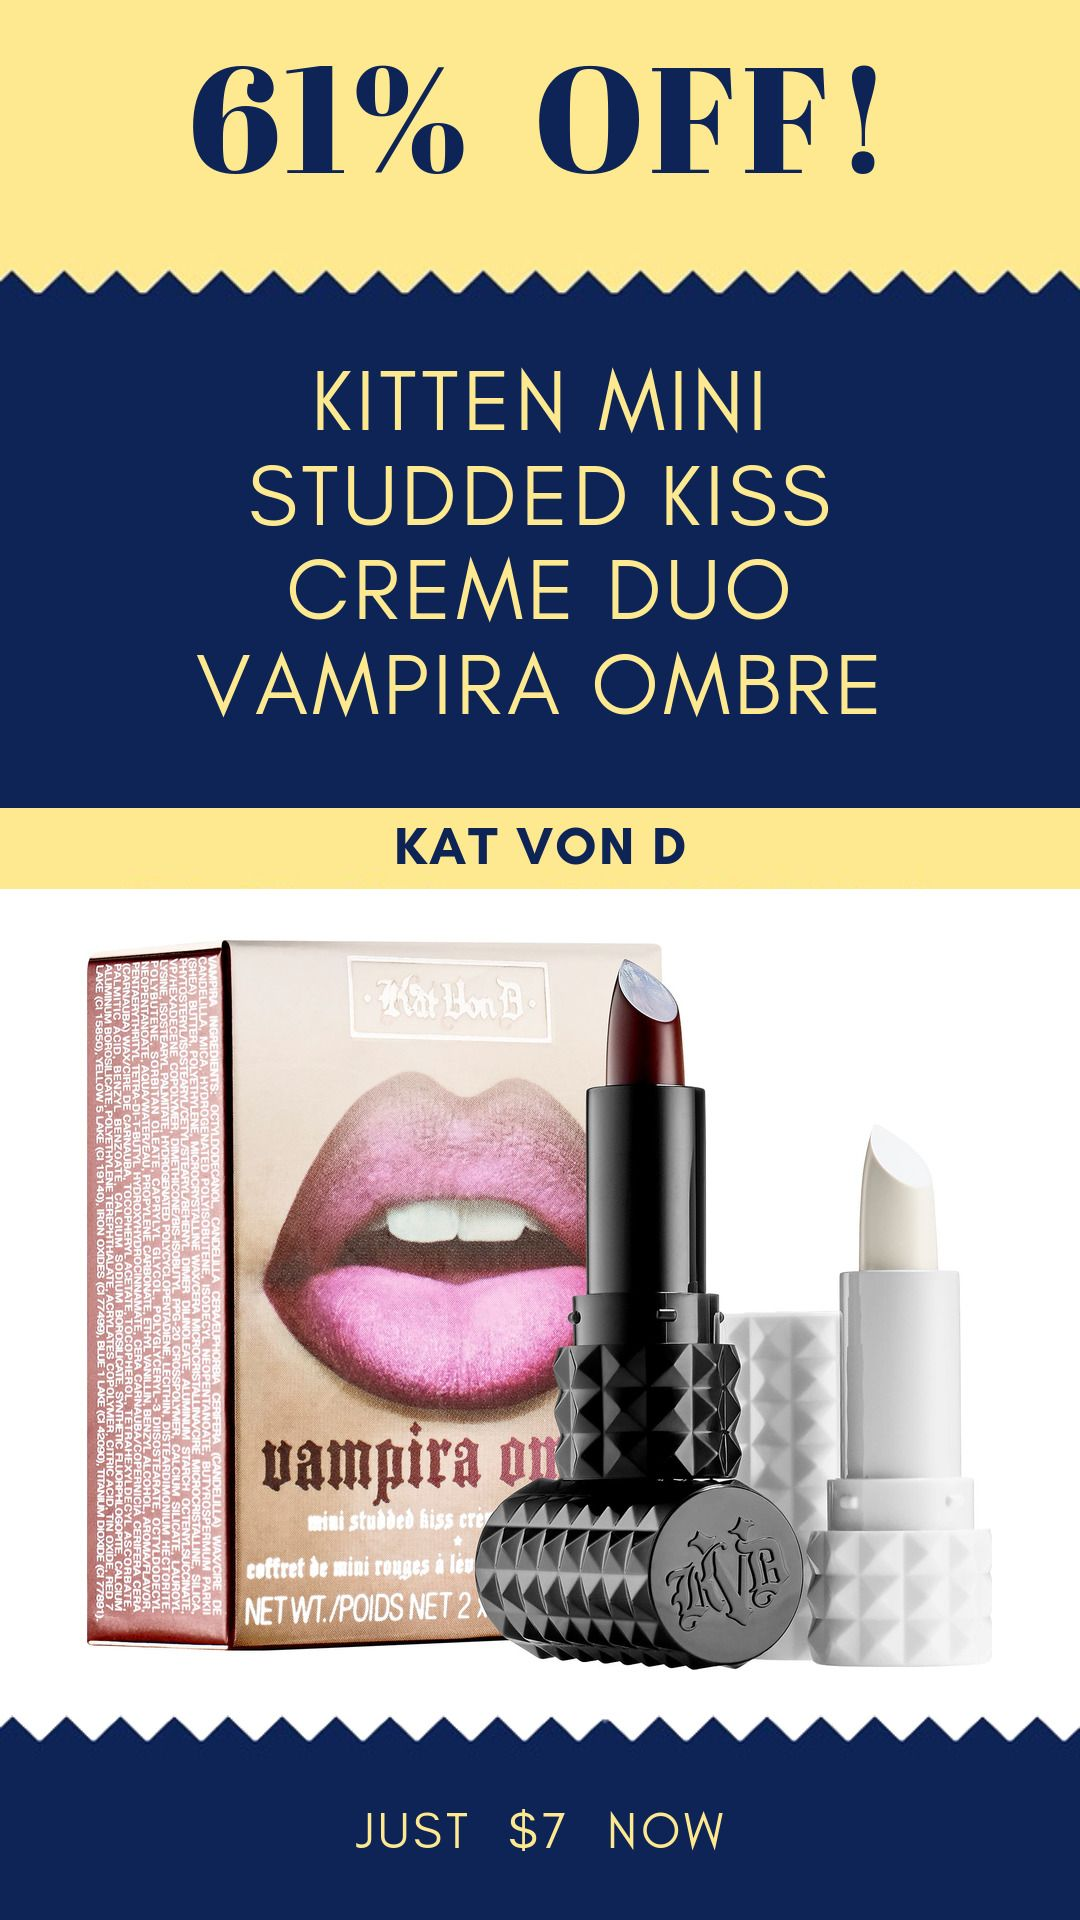 Kitten Mini Studded Kiss Creme Duo Vampira Ombre 61 Off Deal Mini Studs Sephora Creme